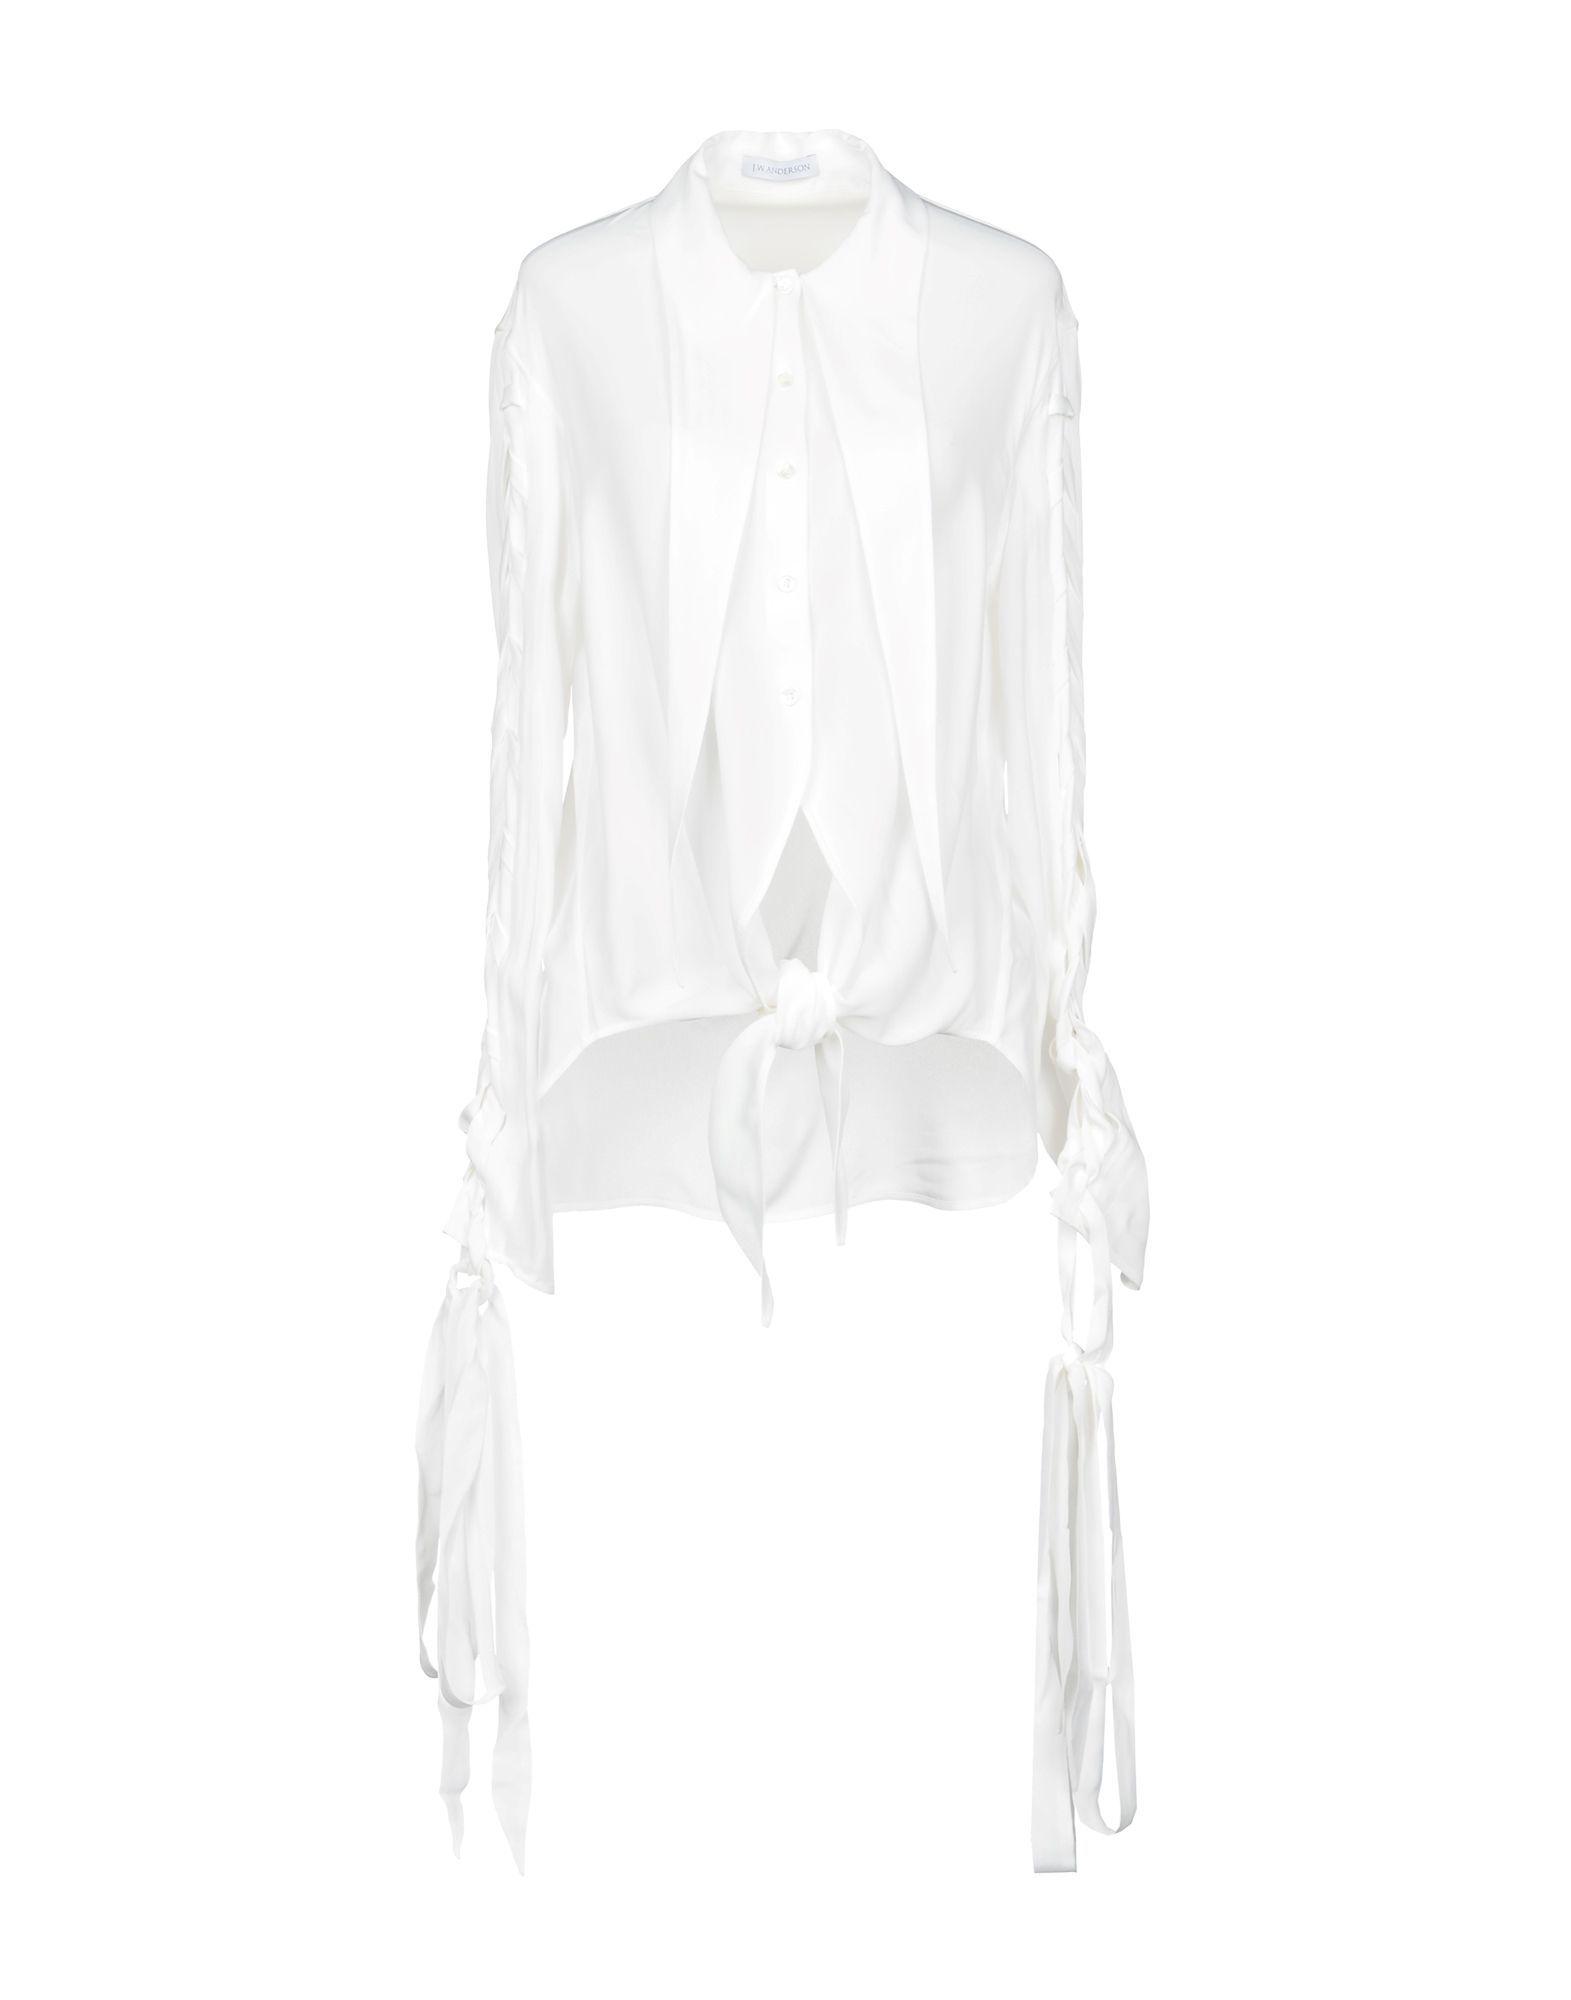 JW Anderson White Crepe Shirt